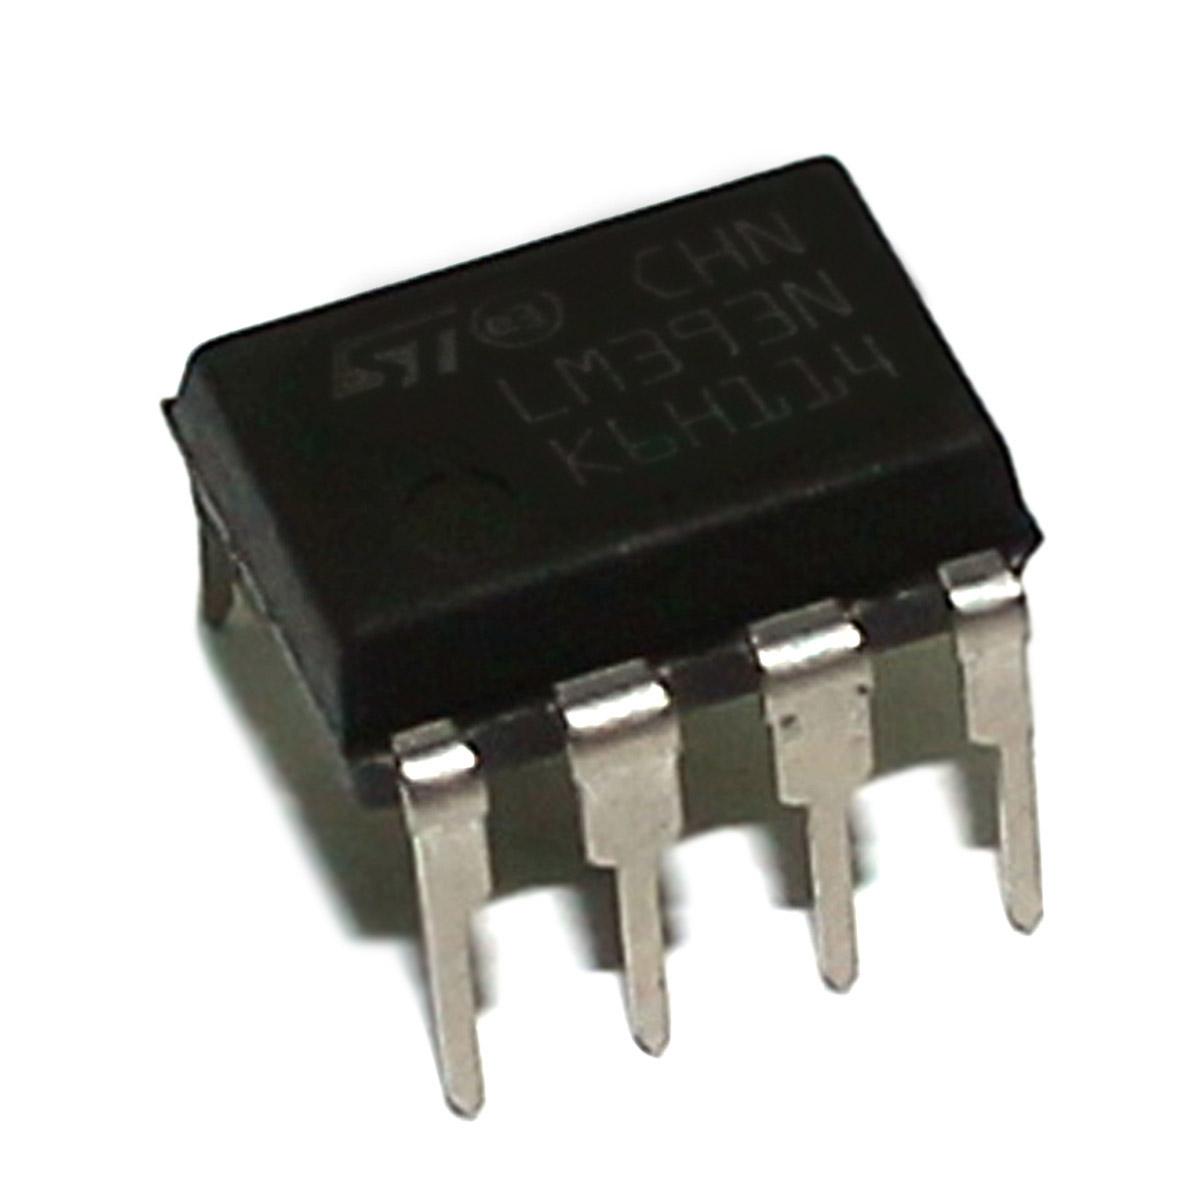 Circuito Integrado Xnor : Circuito integrado lm eletropeças comercial